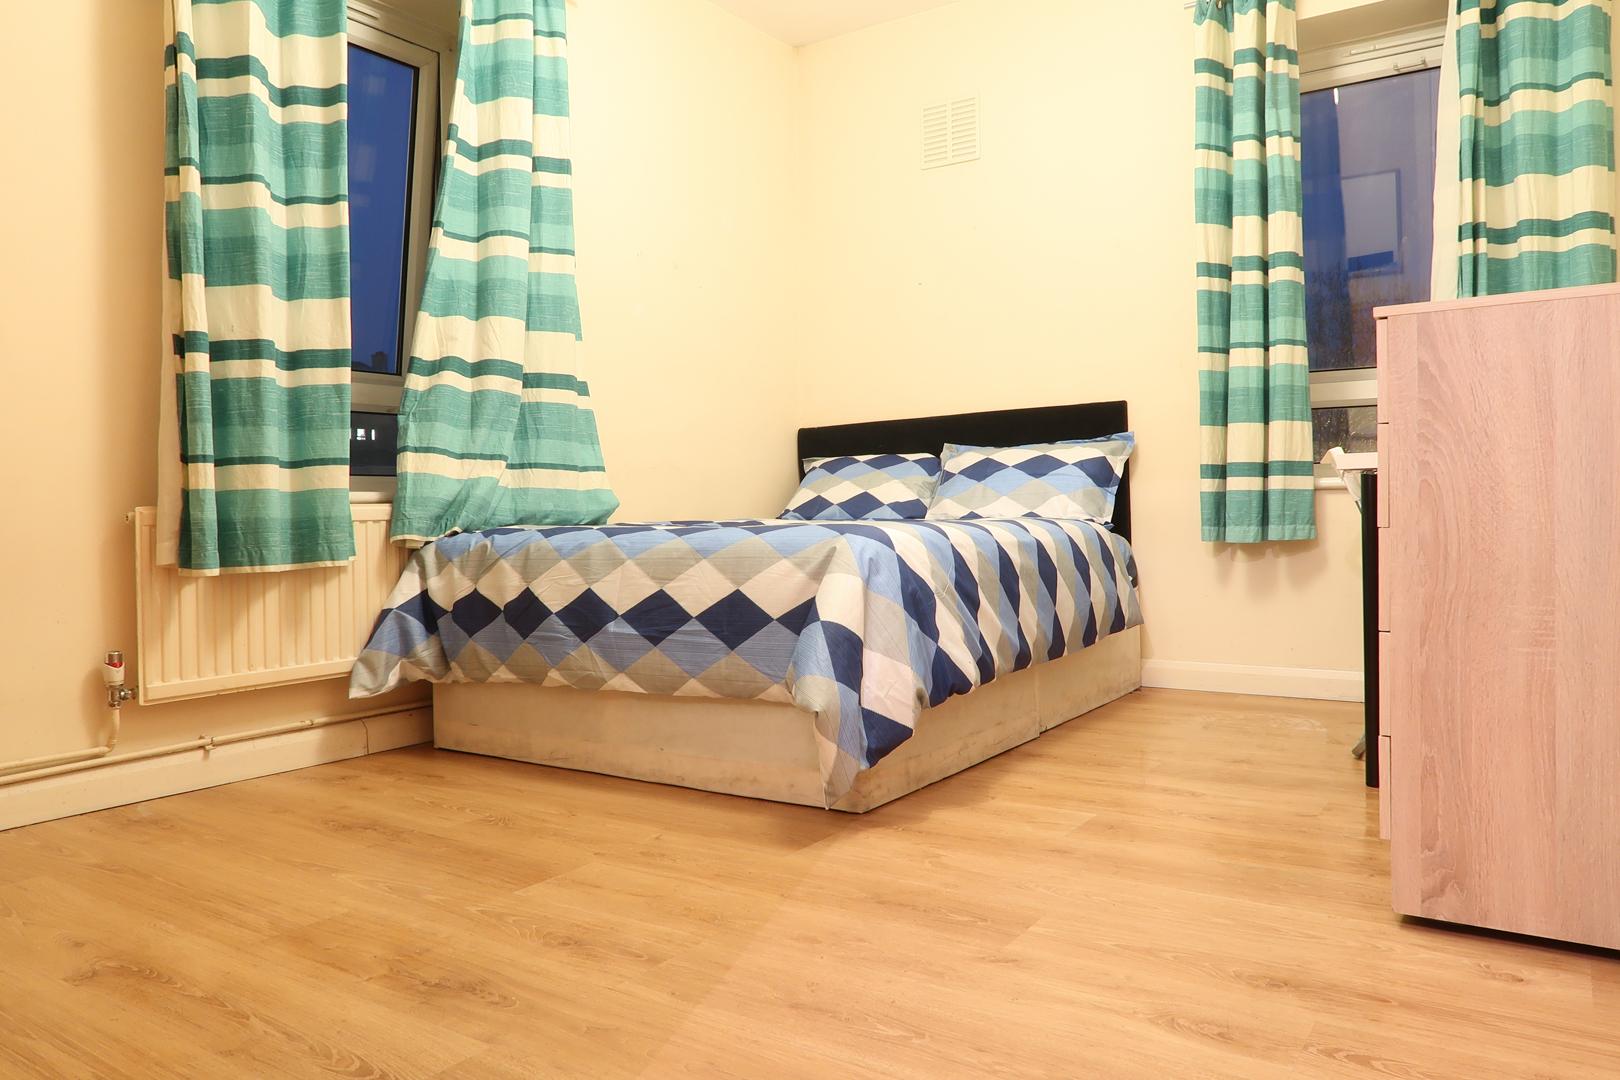 Apartment LIMBOROUGH HOUSE - DELUXE GUEST ROOM 4 photo 20447796